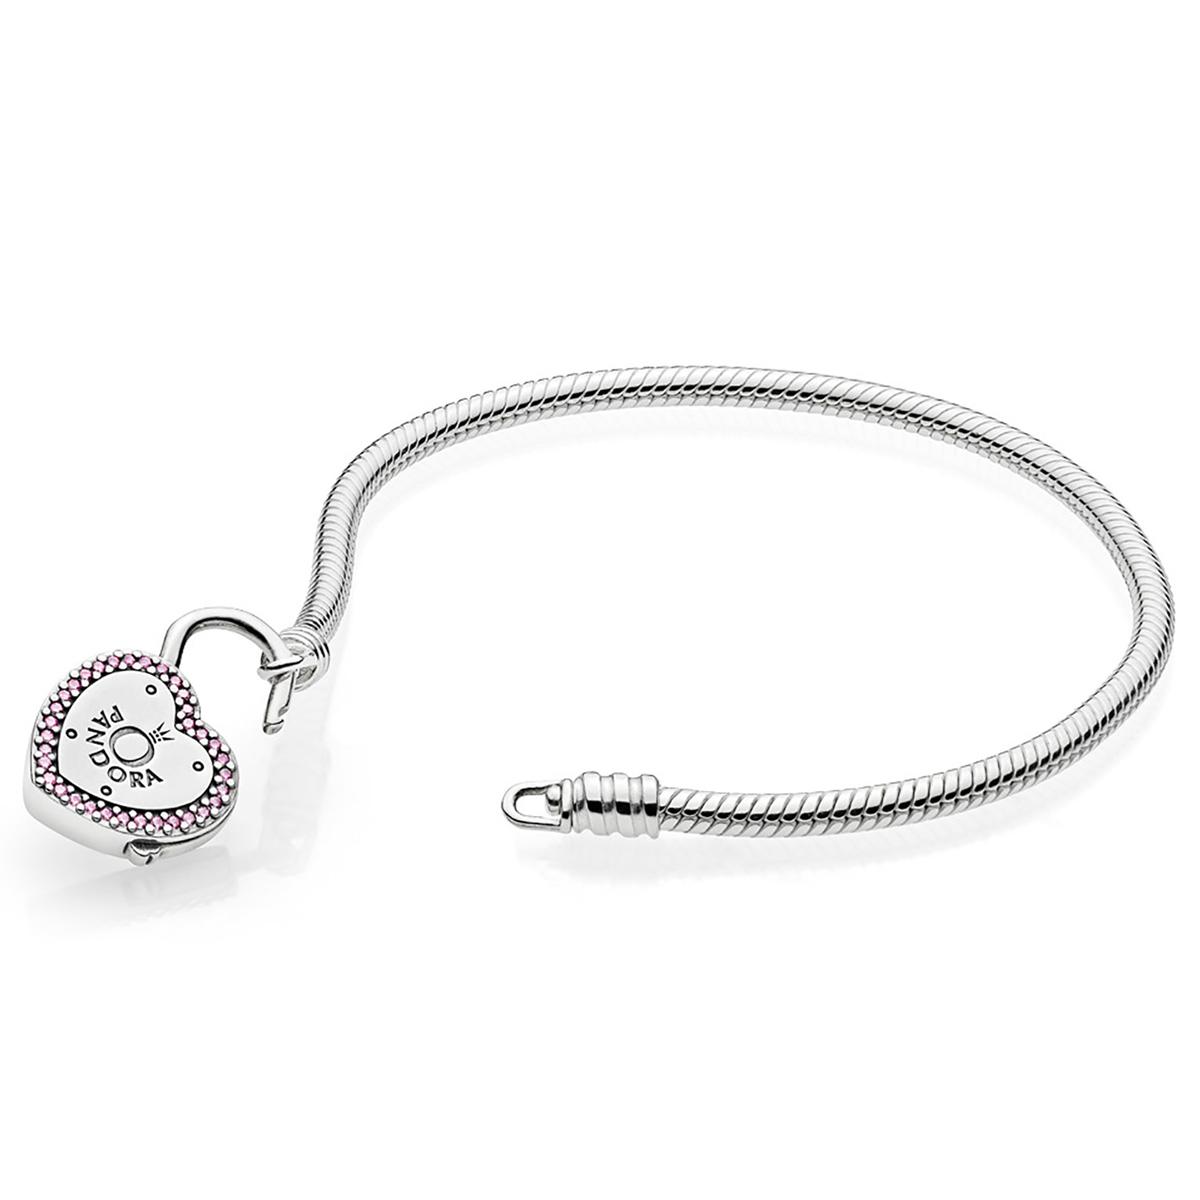 Pandora Lock Your Promise Bracelet